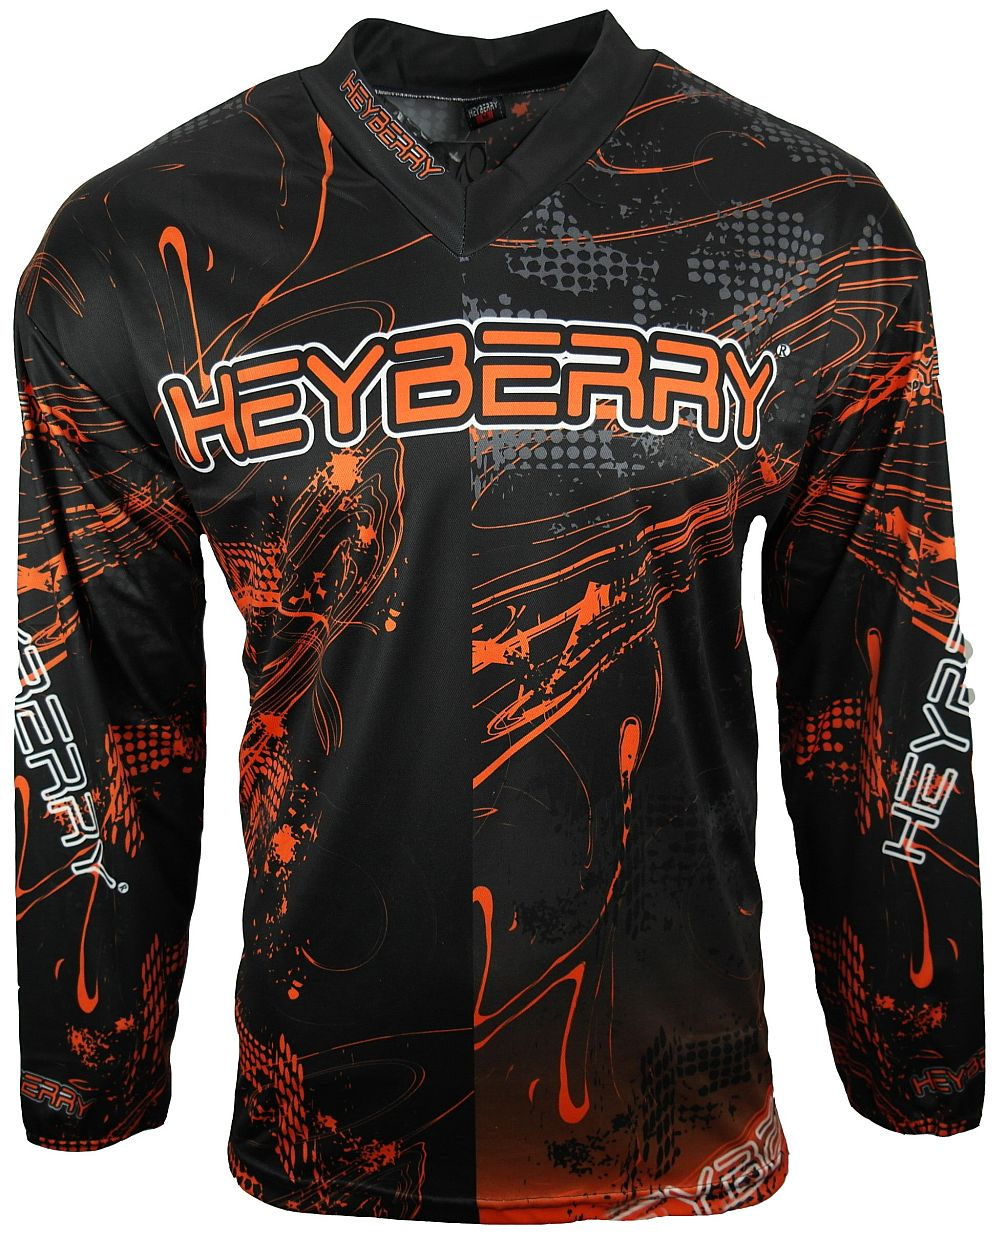 Heyberry Motocross MX Shirt Jersey Trikot schwarz orange Gr. M - XXL